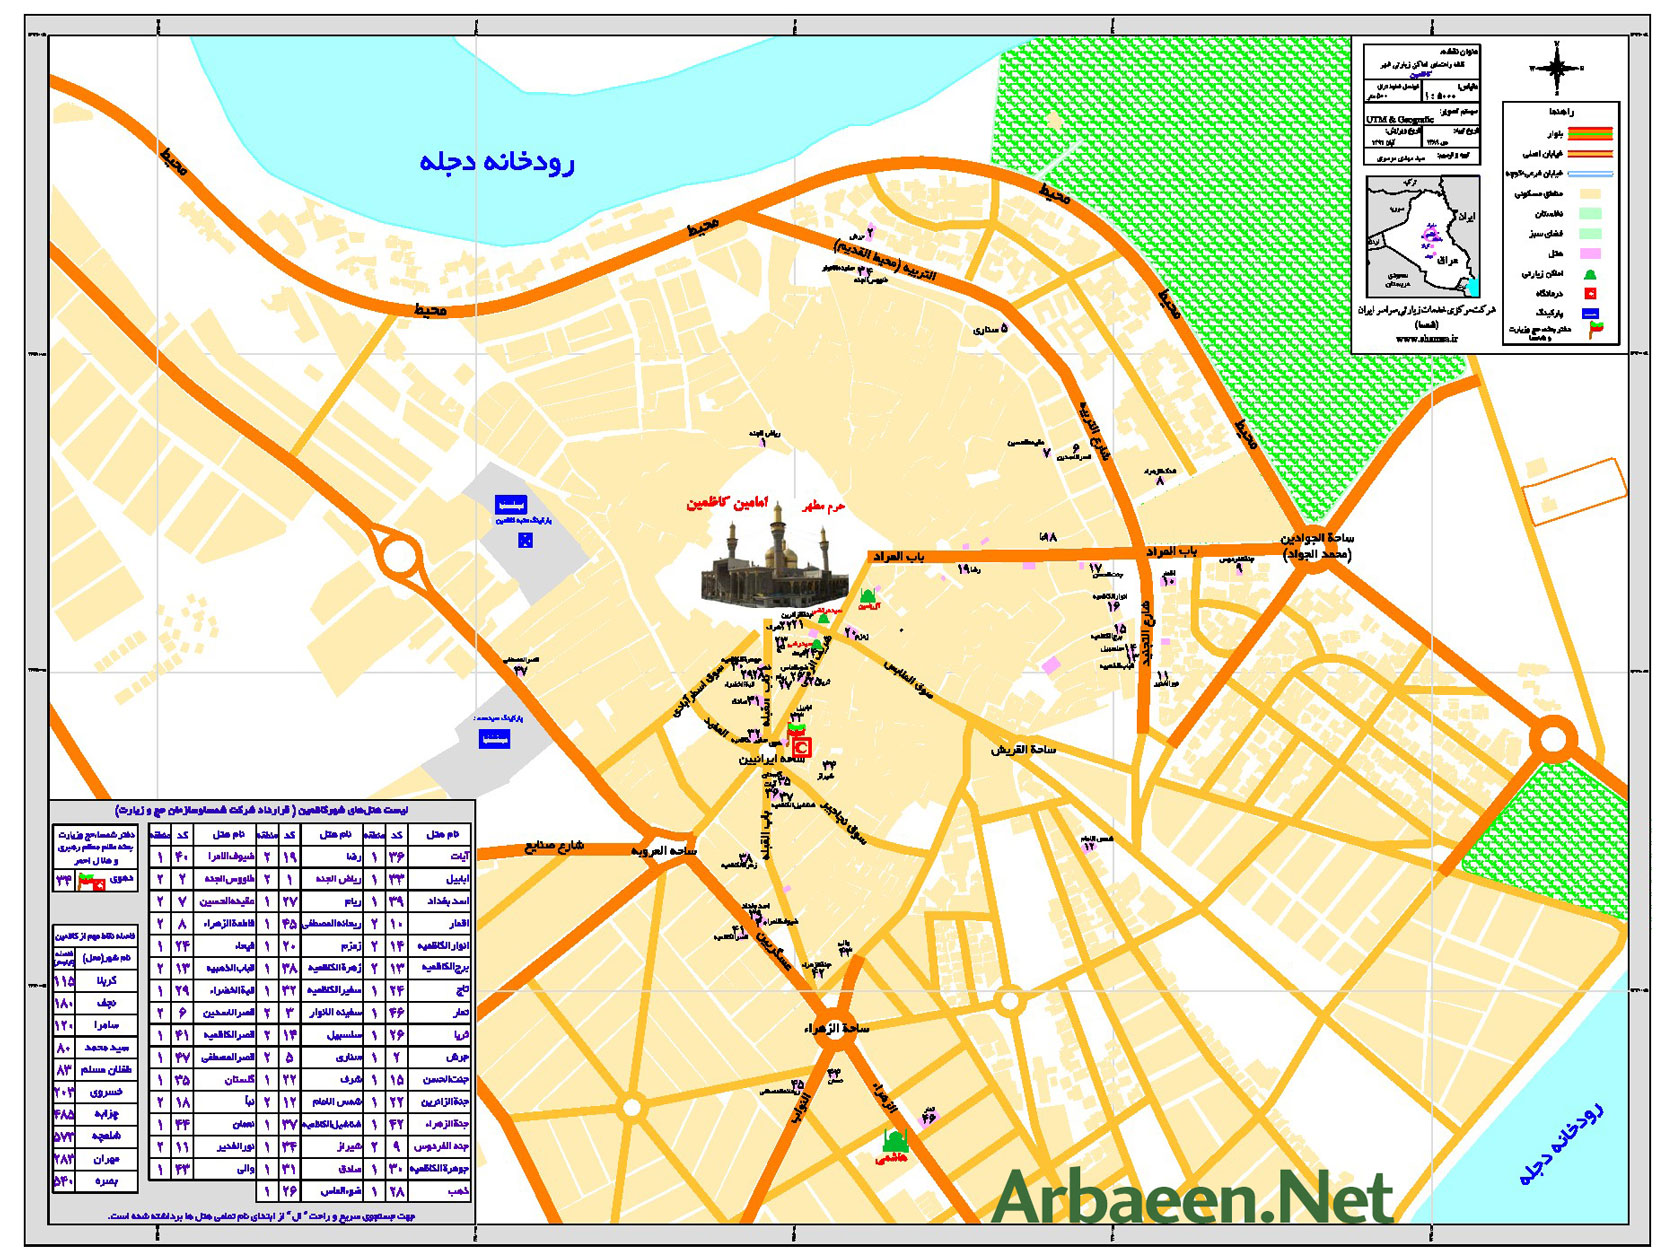 نقشه ی شهر کاظمین